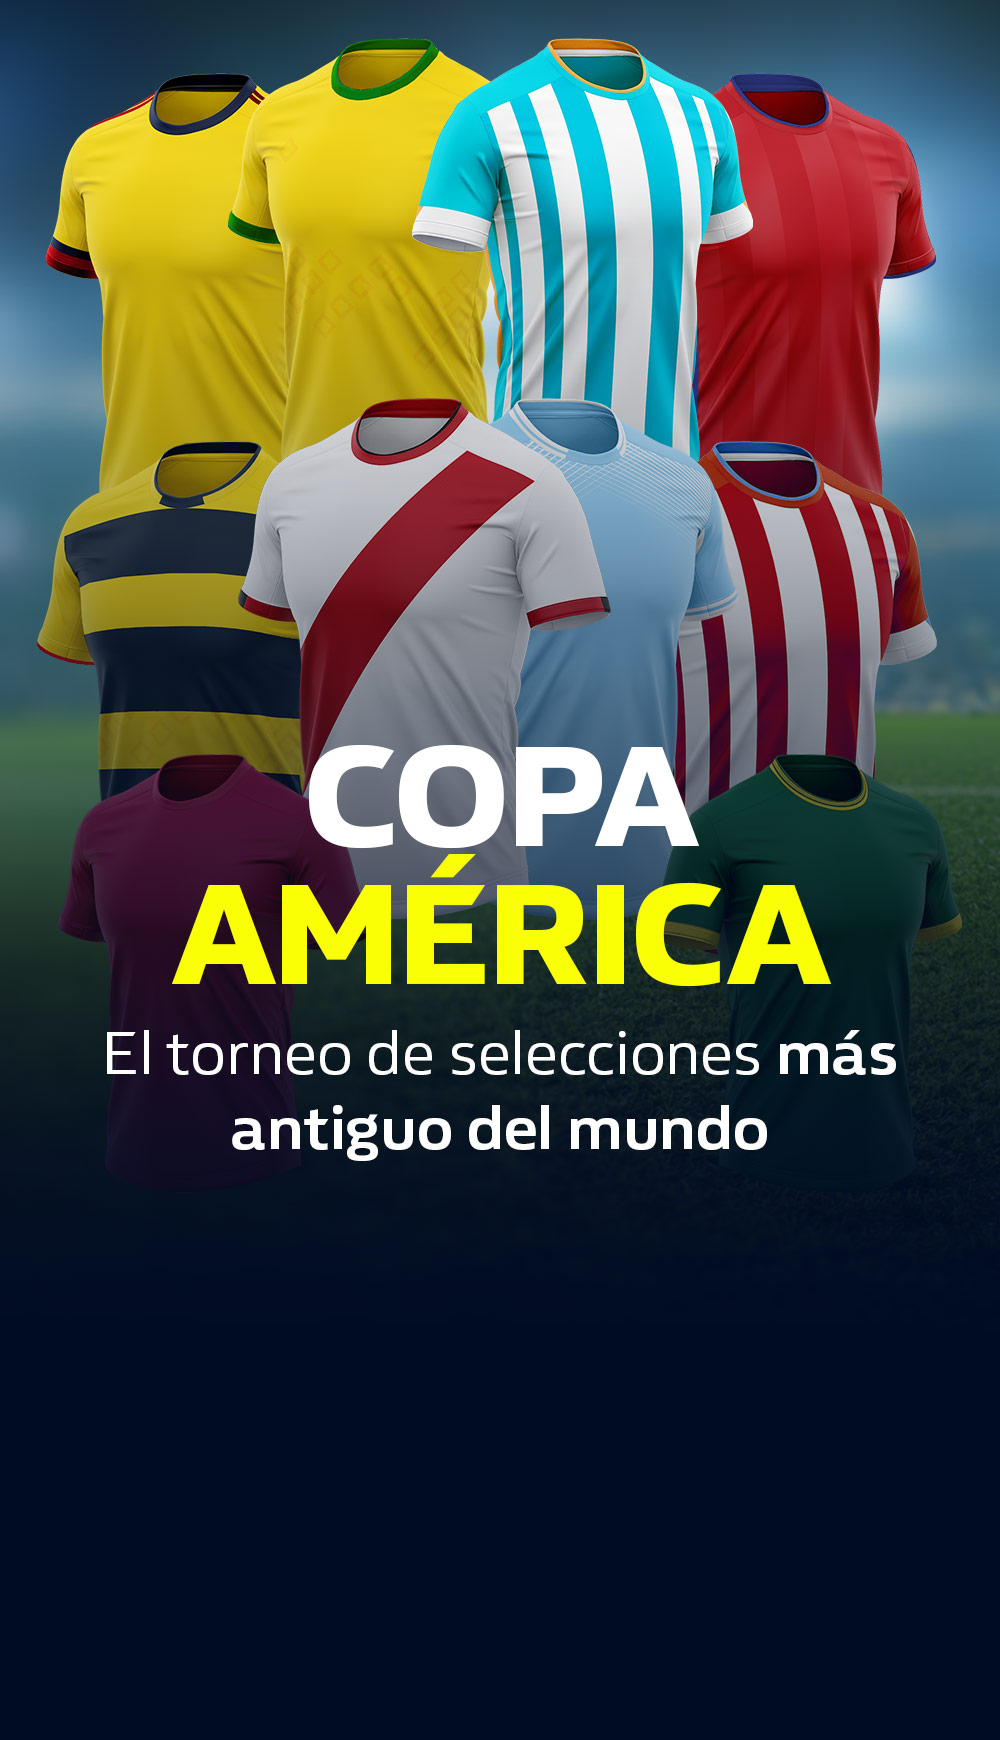 home_copa_america_Mobile_full